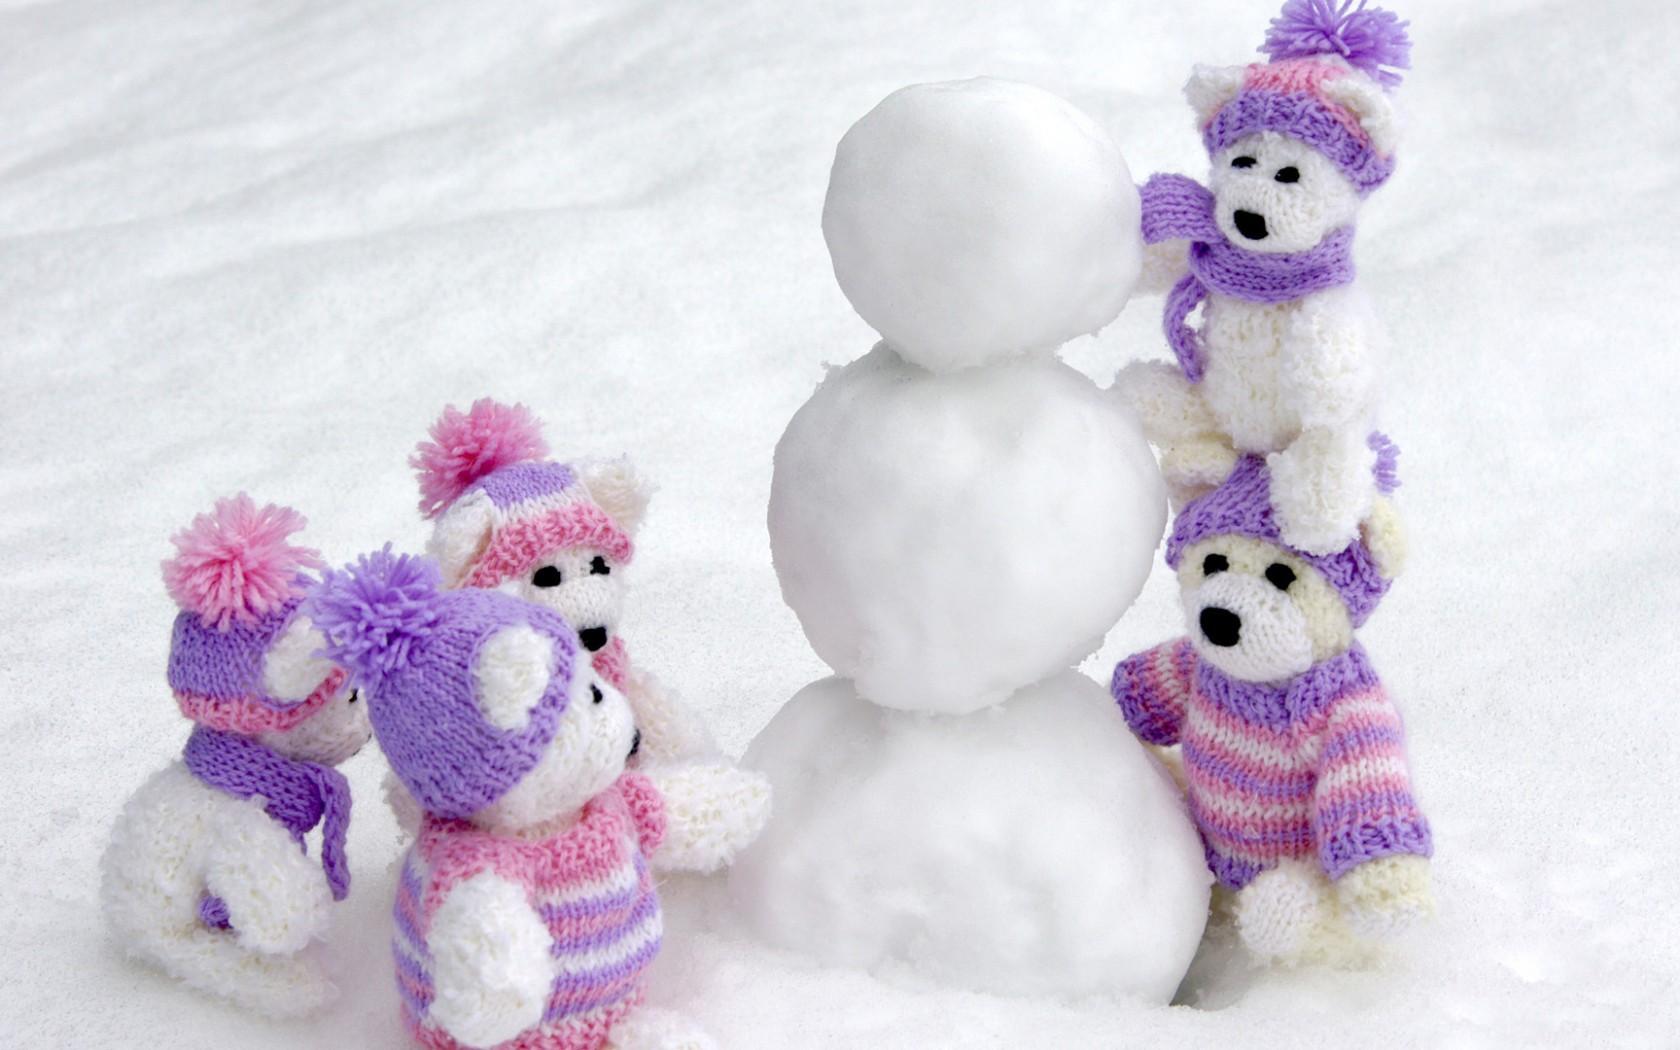 Peluches en la nieve - 1680x1050